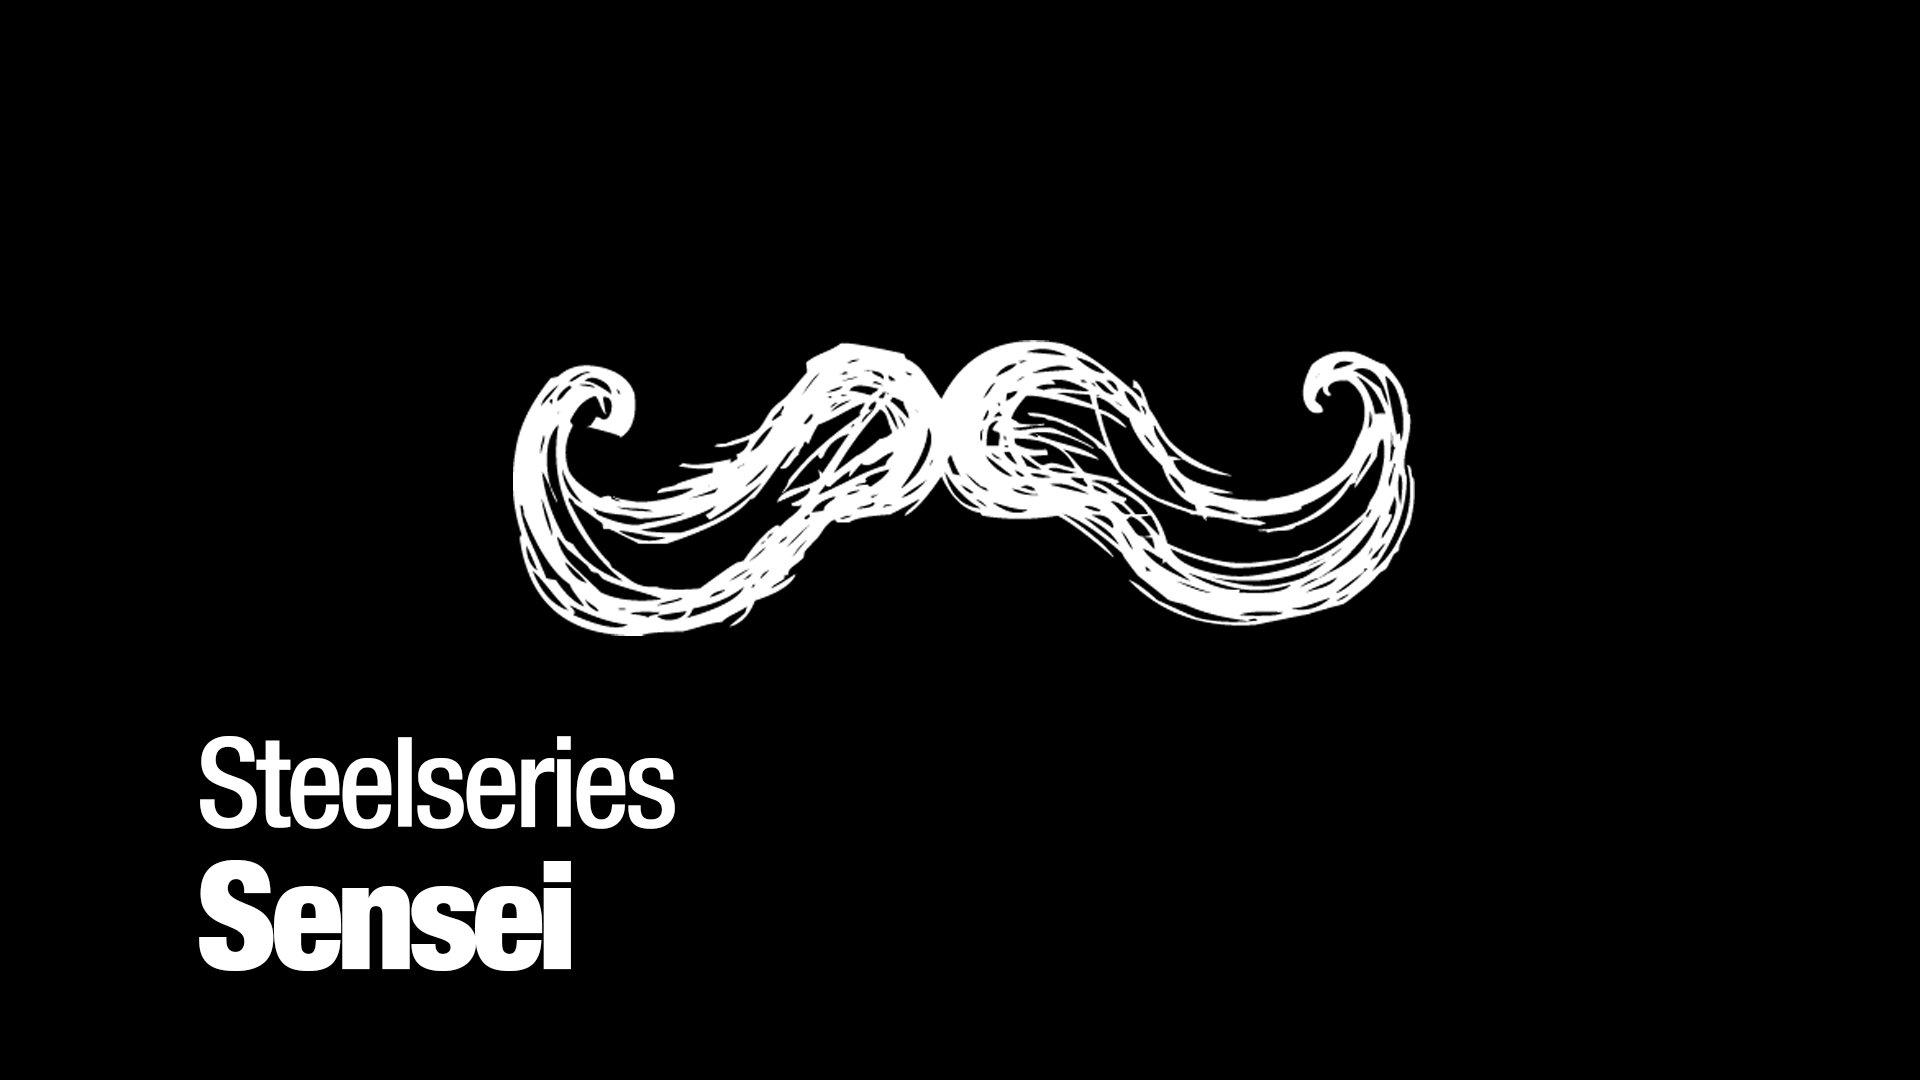 steelseries sensei how to change profile